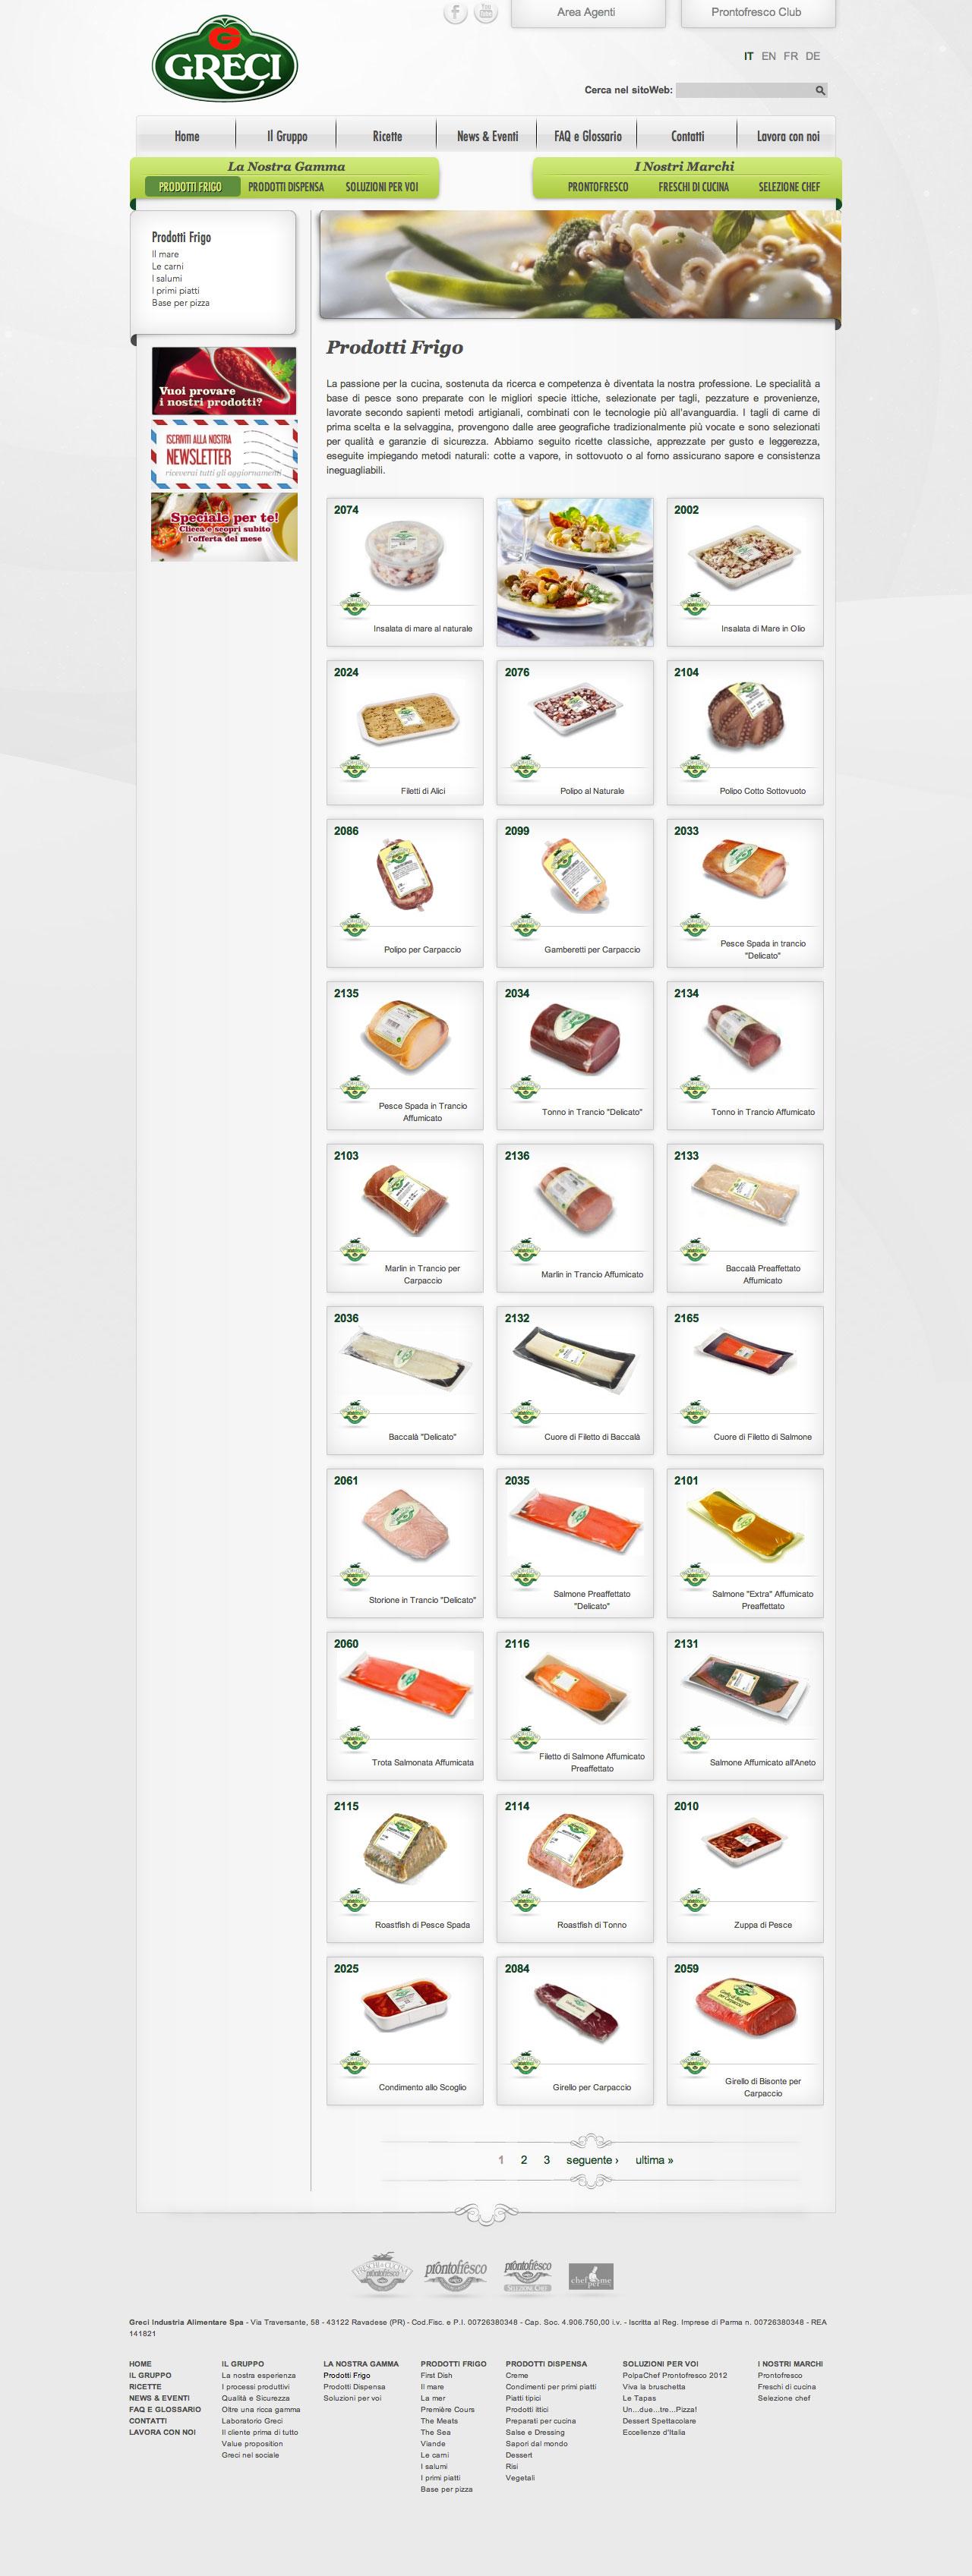 Greci Products